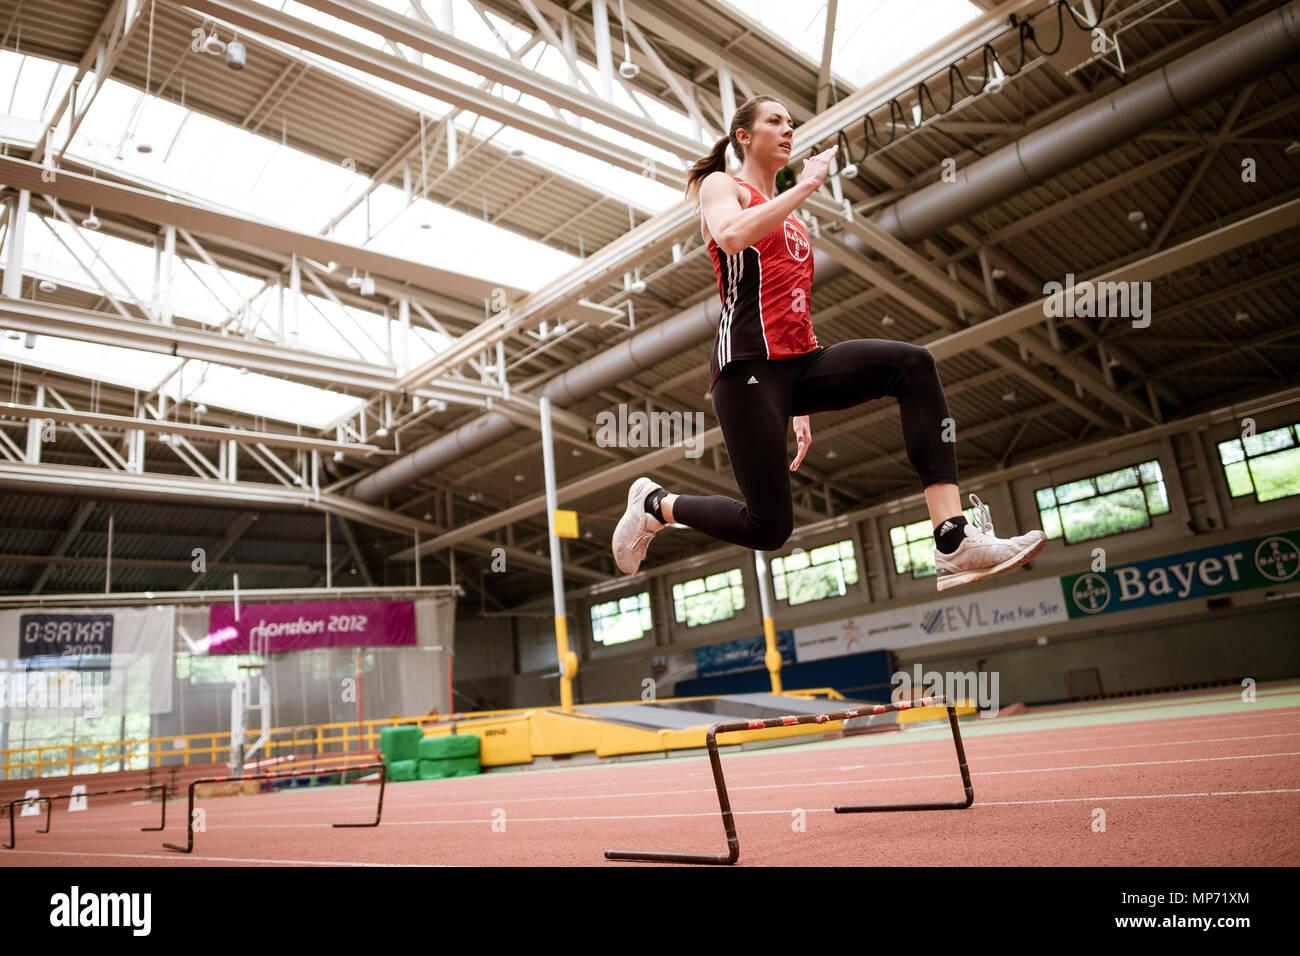 11 May 2018, Germany, Leverkusen: Pole-jumper Katharina Bauer of TSV Bayer 04 Leverkusen jumps over mini-hurdles. Photo: Marius Becker/dpa - Stock Image